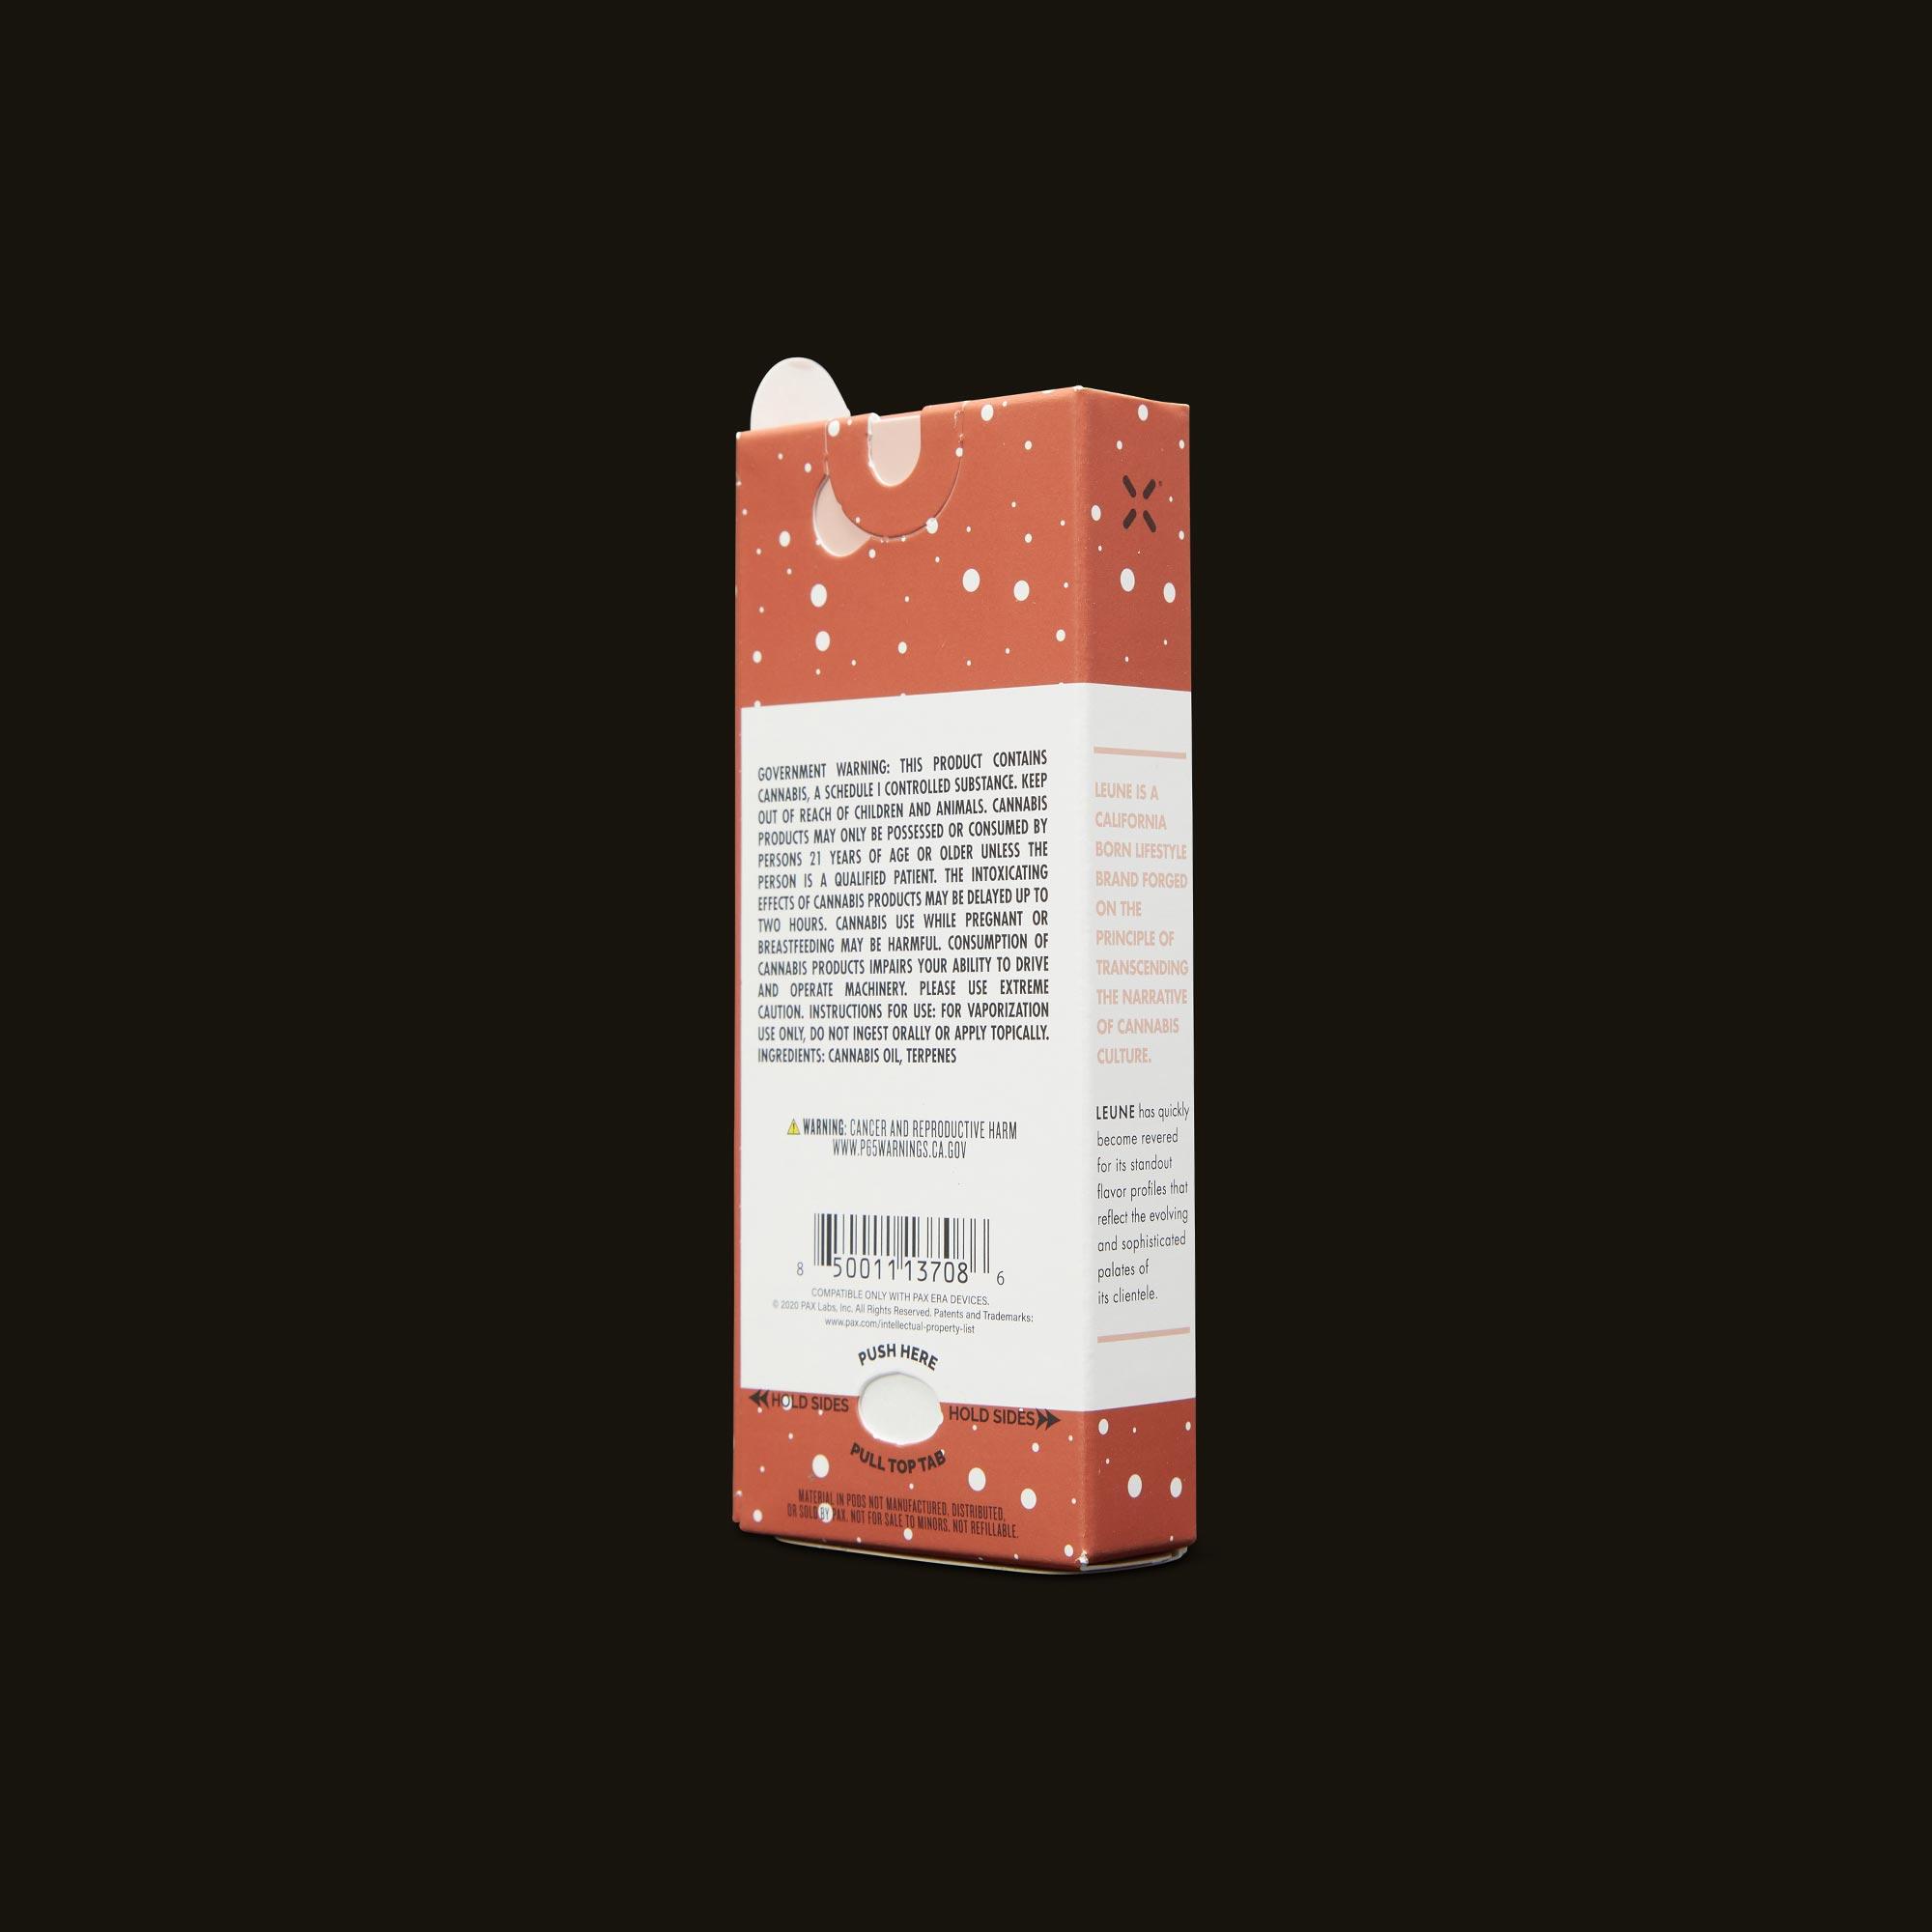 LEUNE Sol Berry PAX Era Pod Back Packaging